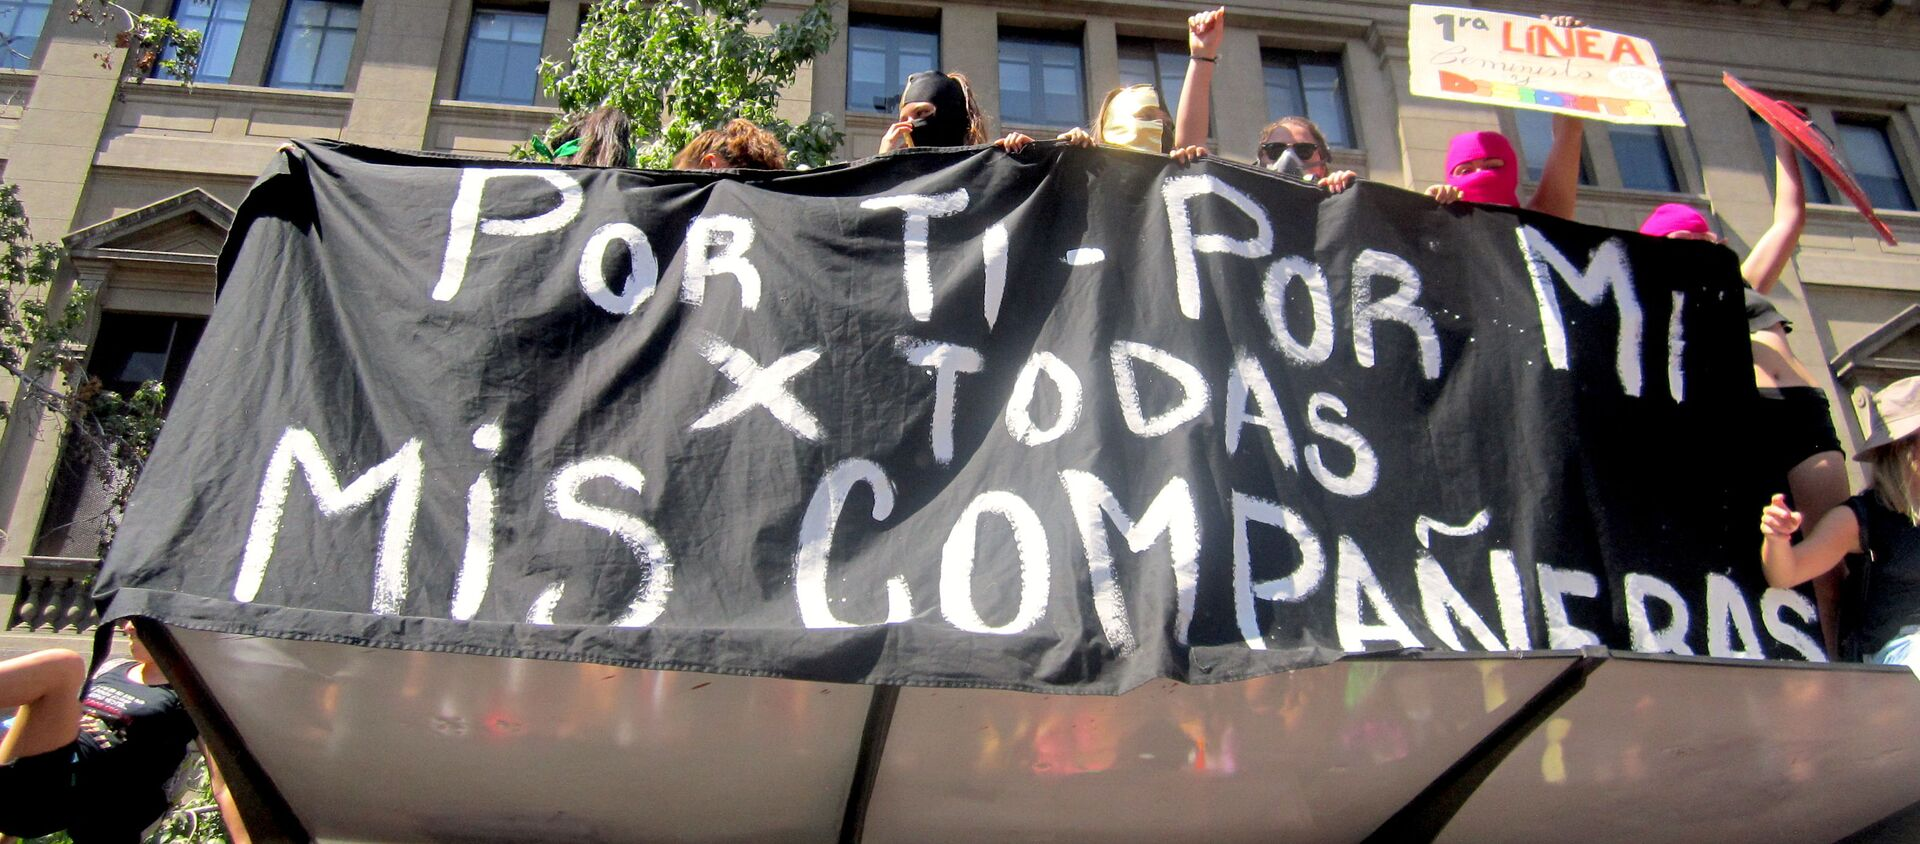 Pancarta en manifestación feminista en Santiago - Sputnik Mundo, 1920, 23.01.2021